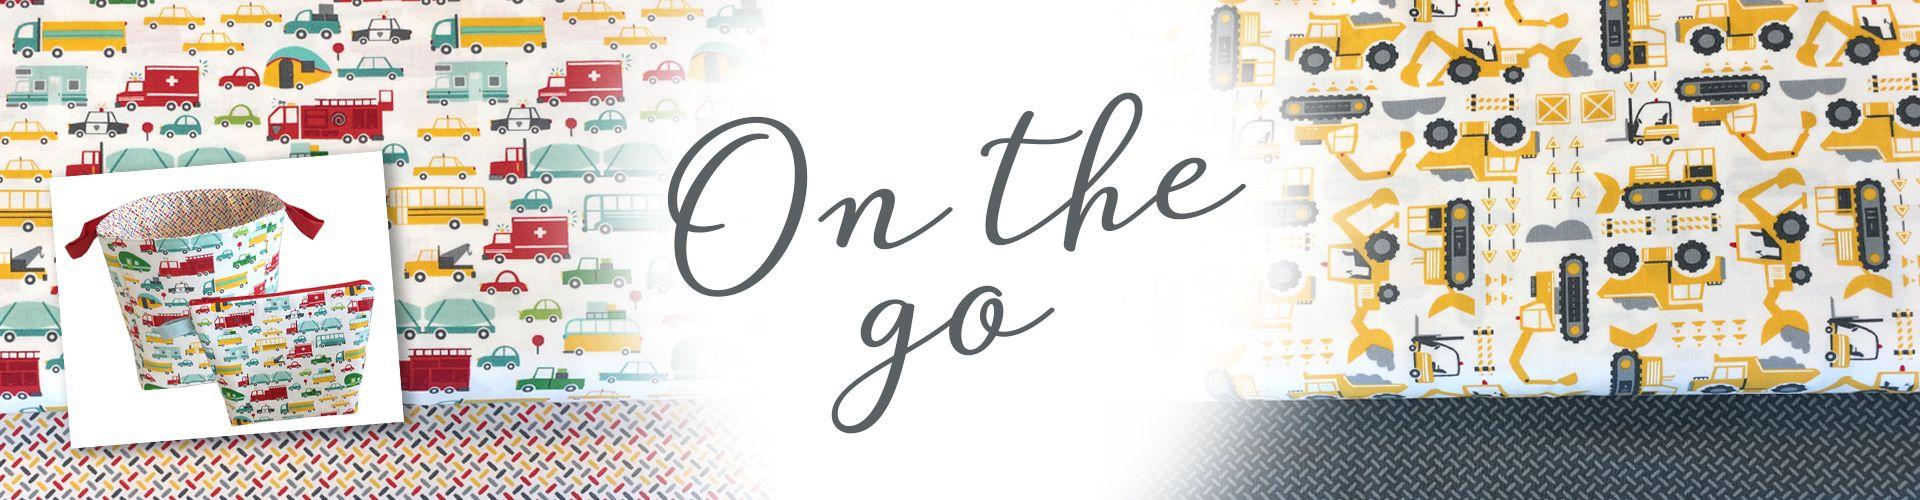 quiltestæsj-1920x500-On the go